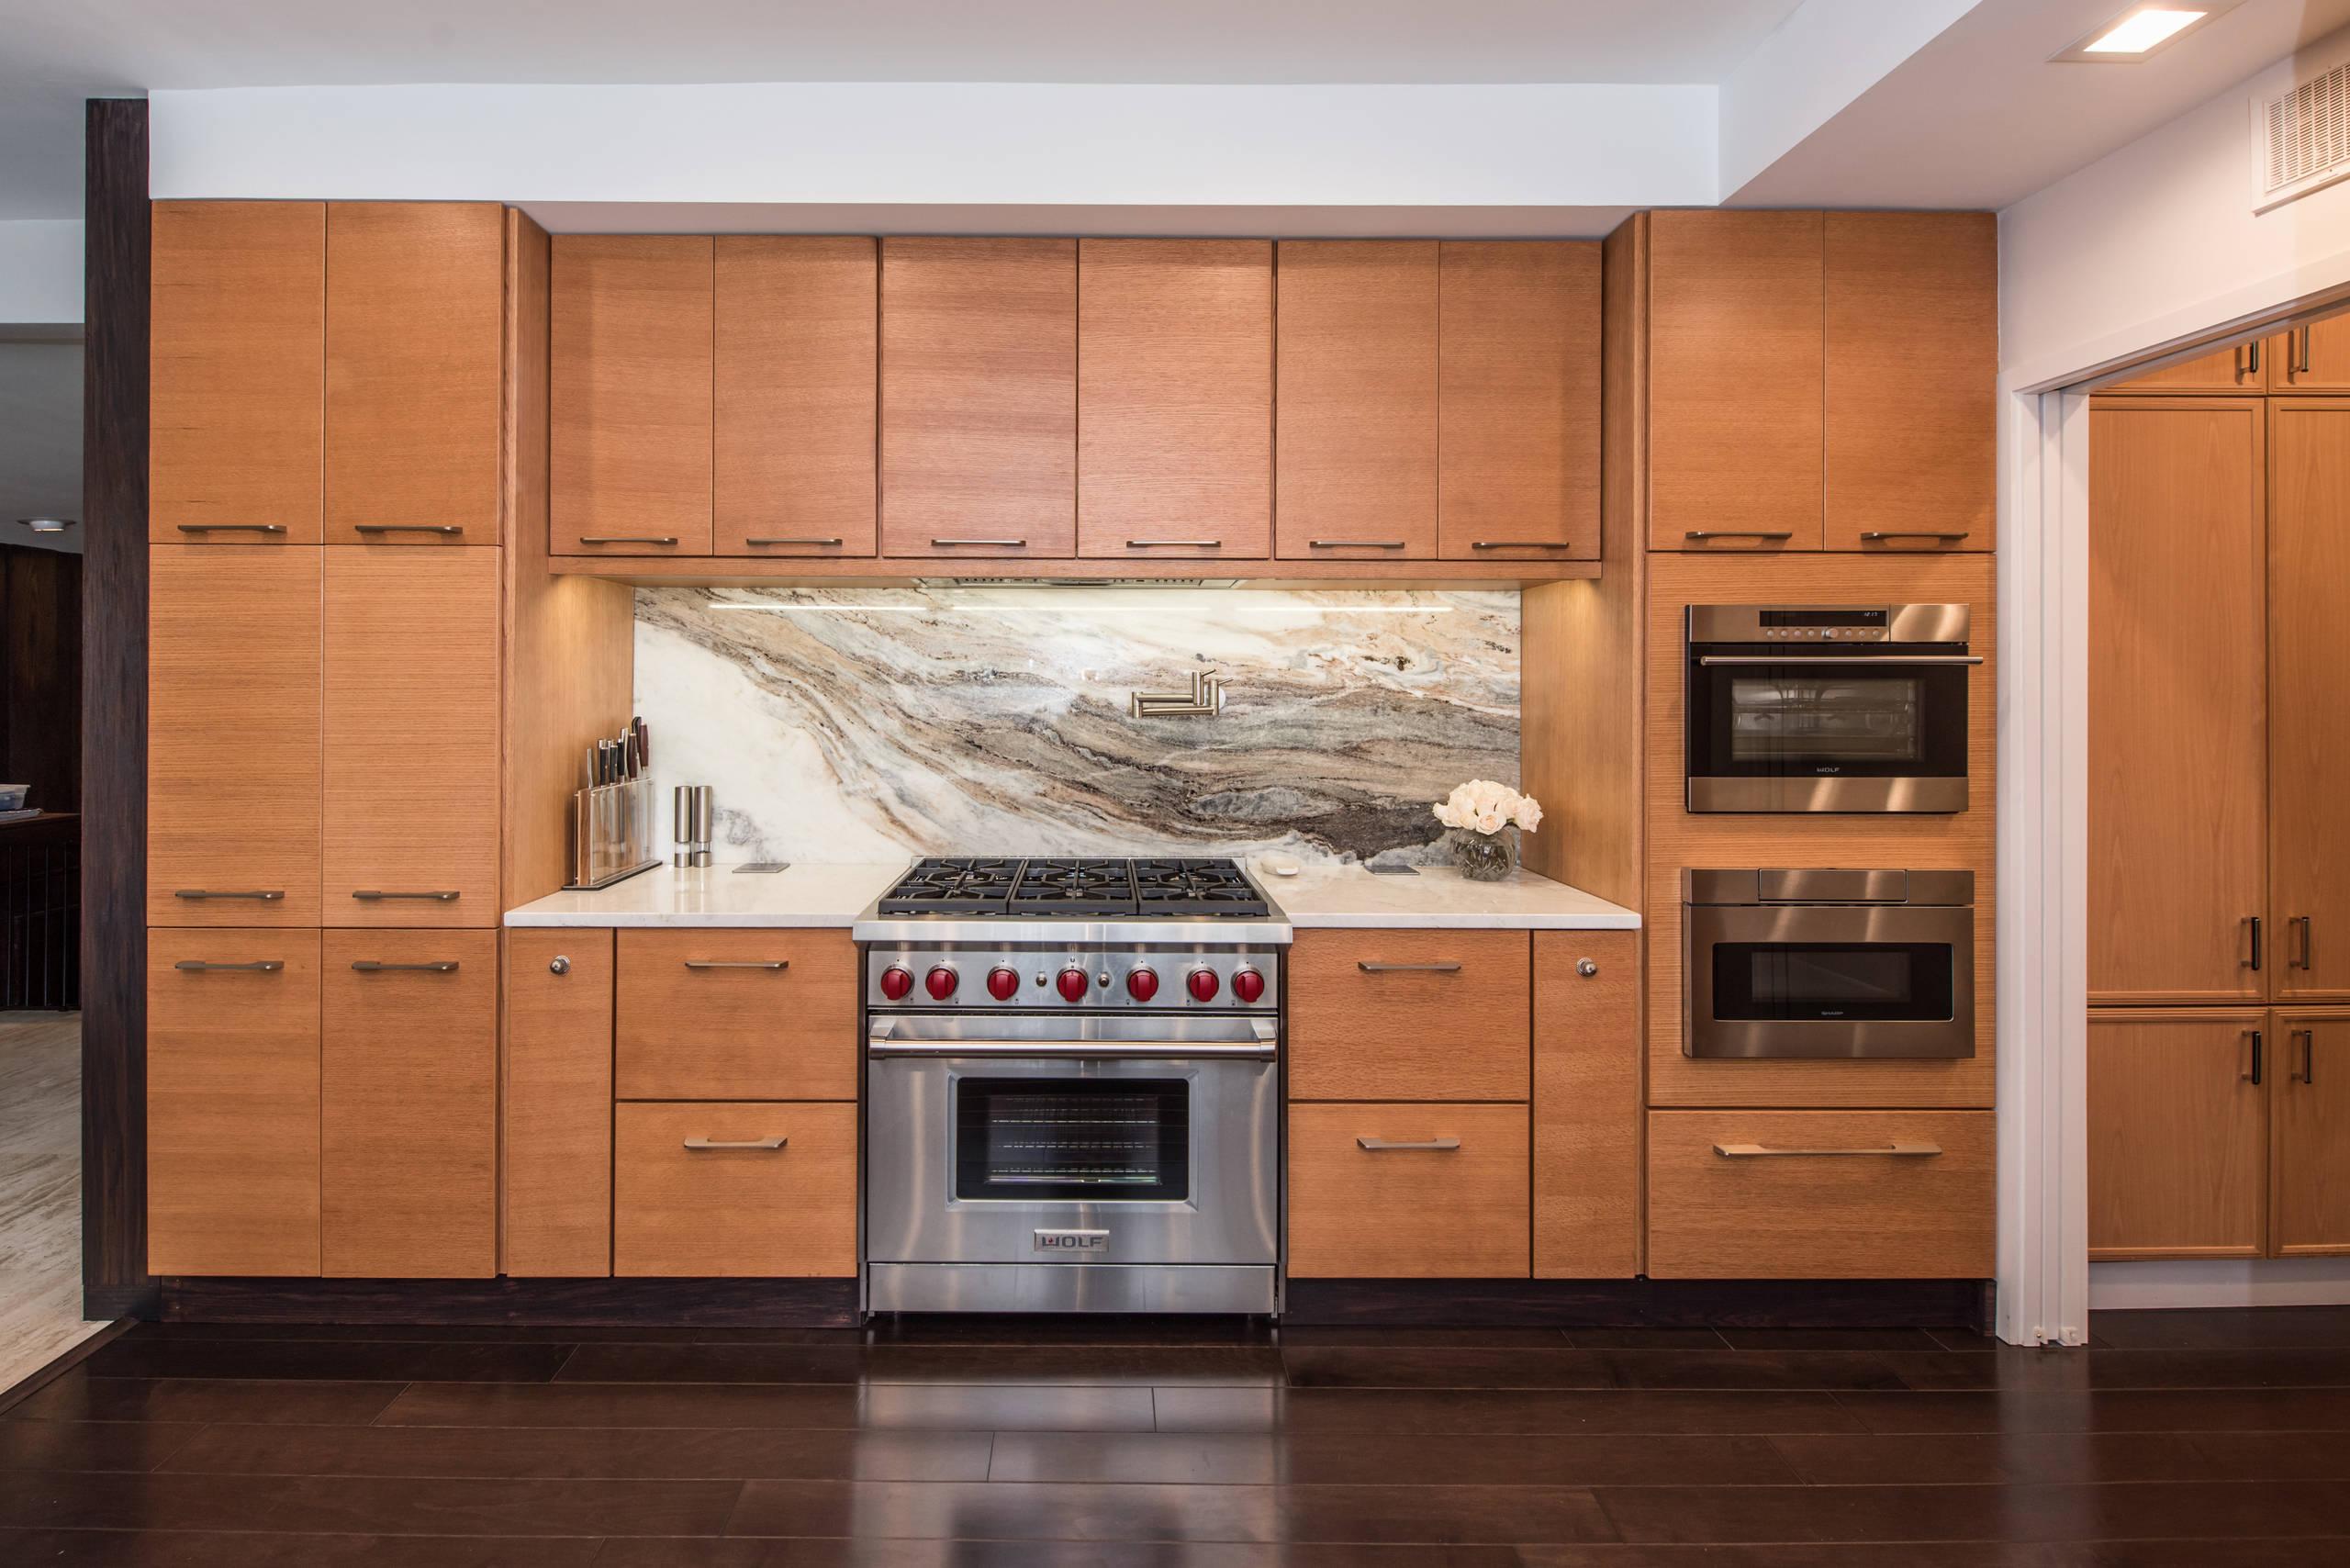 Expansive Wood Kitchen with Marble Back Splash